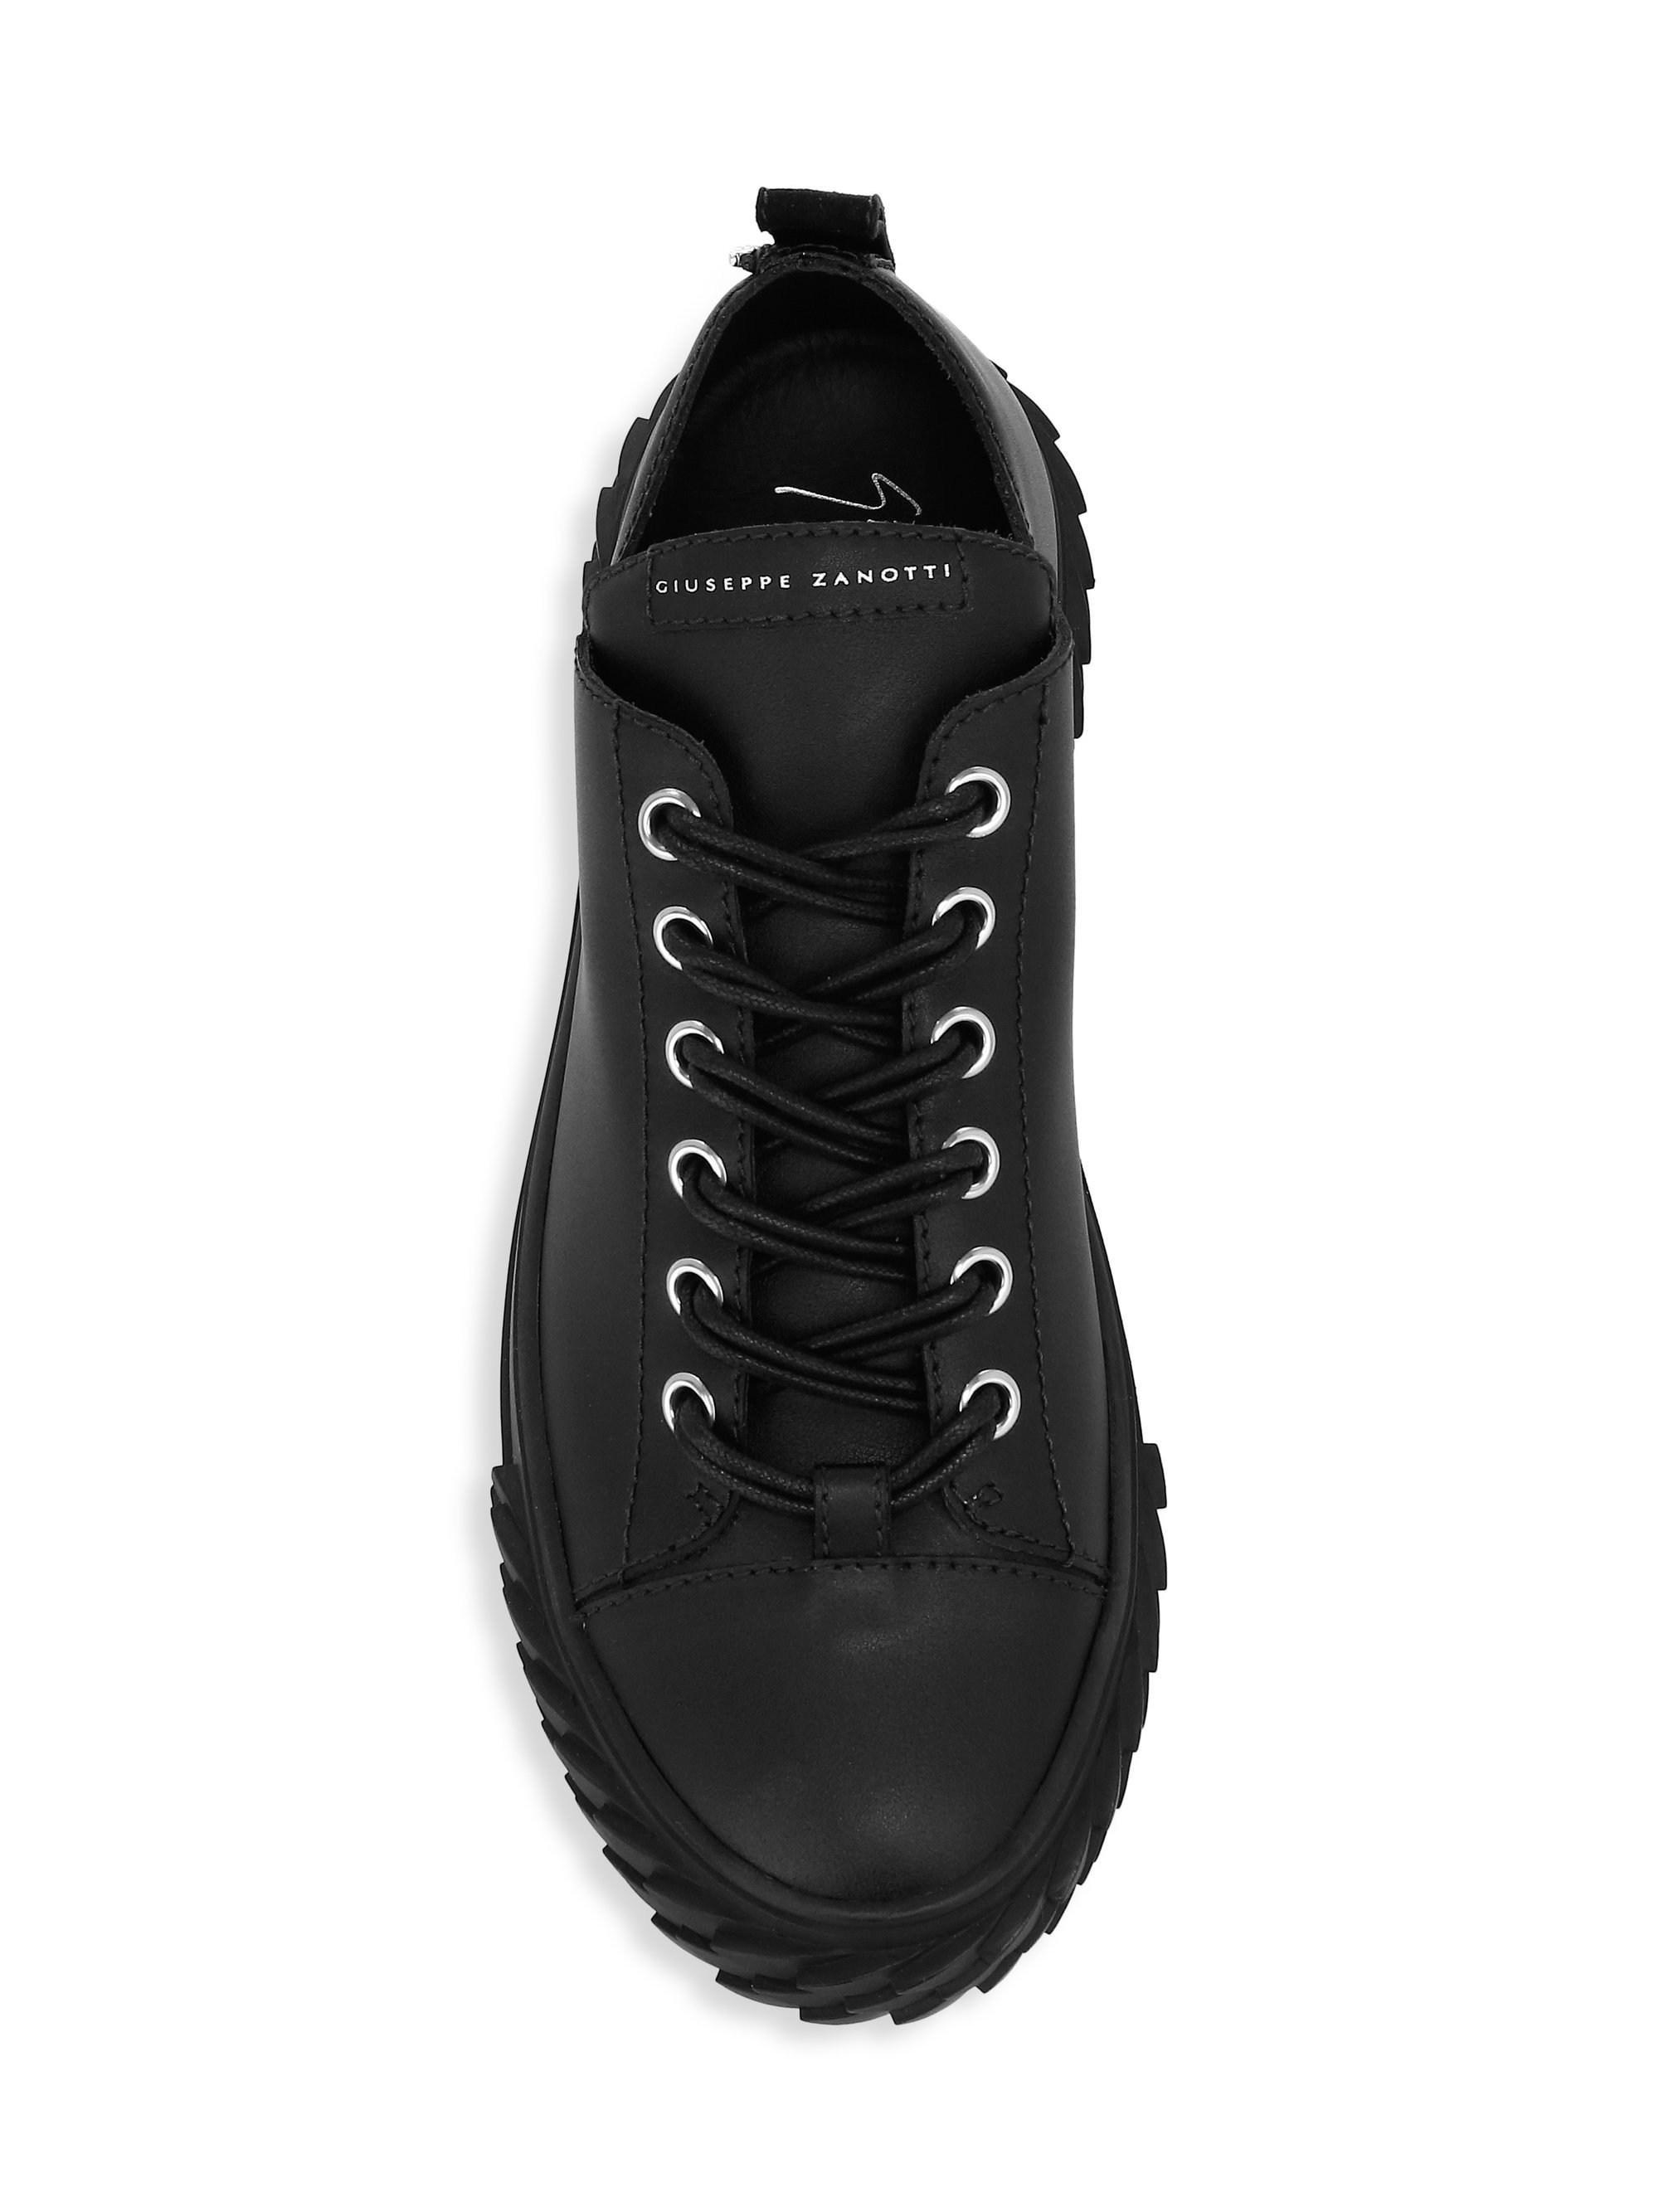 61dced9c77082 Giuseppe Zanotti Men's Moxie Leather Low-top Sneakers - Nero - Size ...